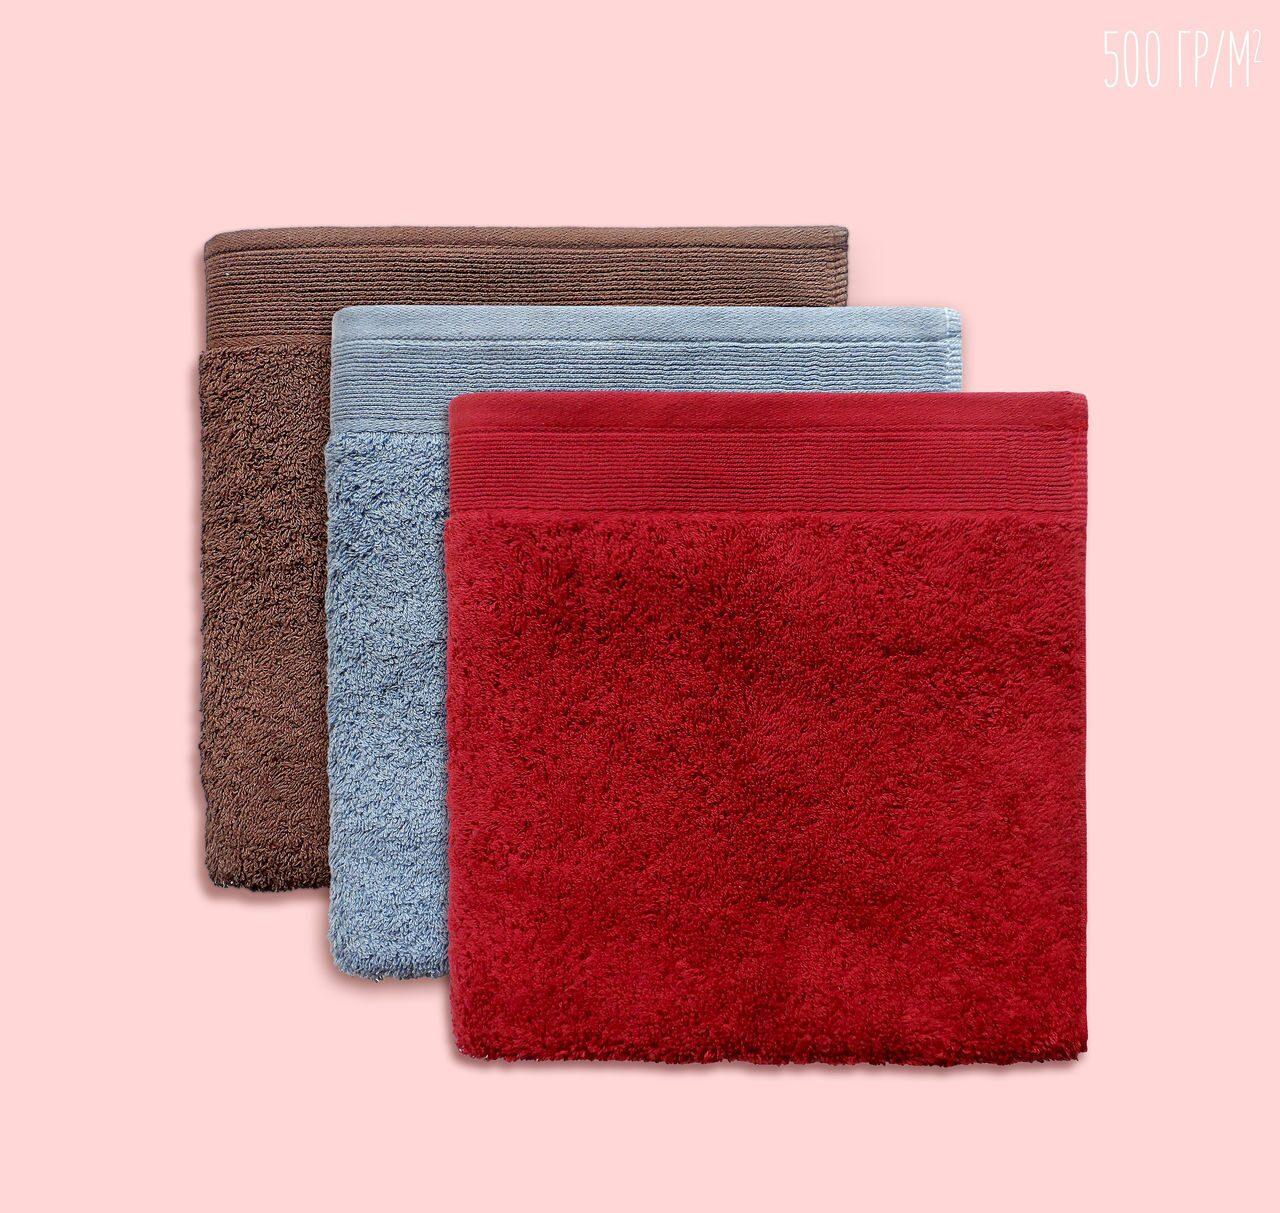 однотонные полотенца 500 гр